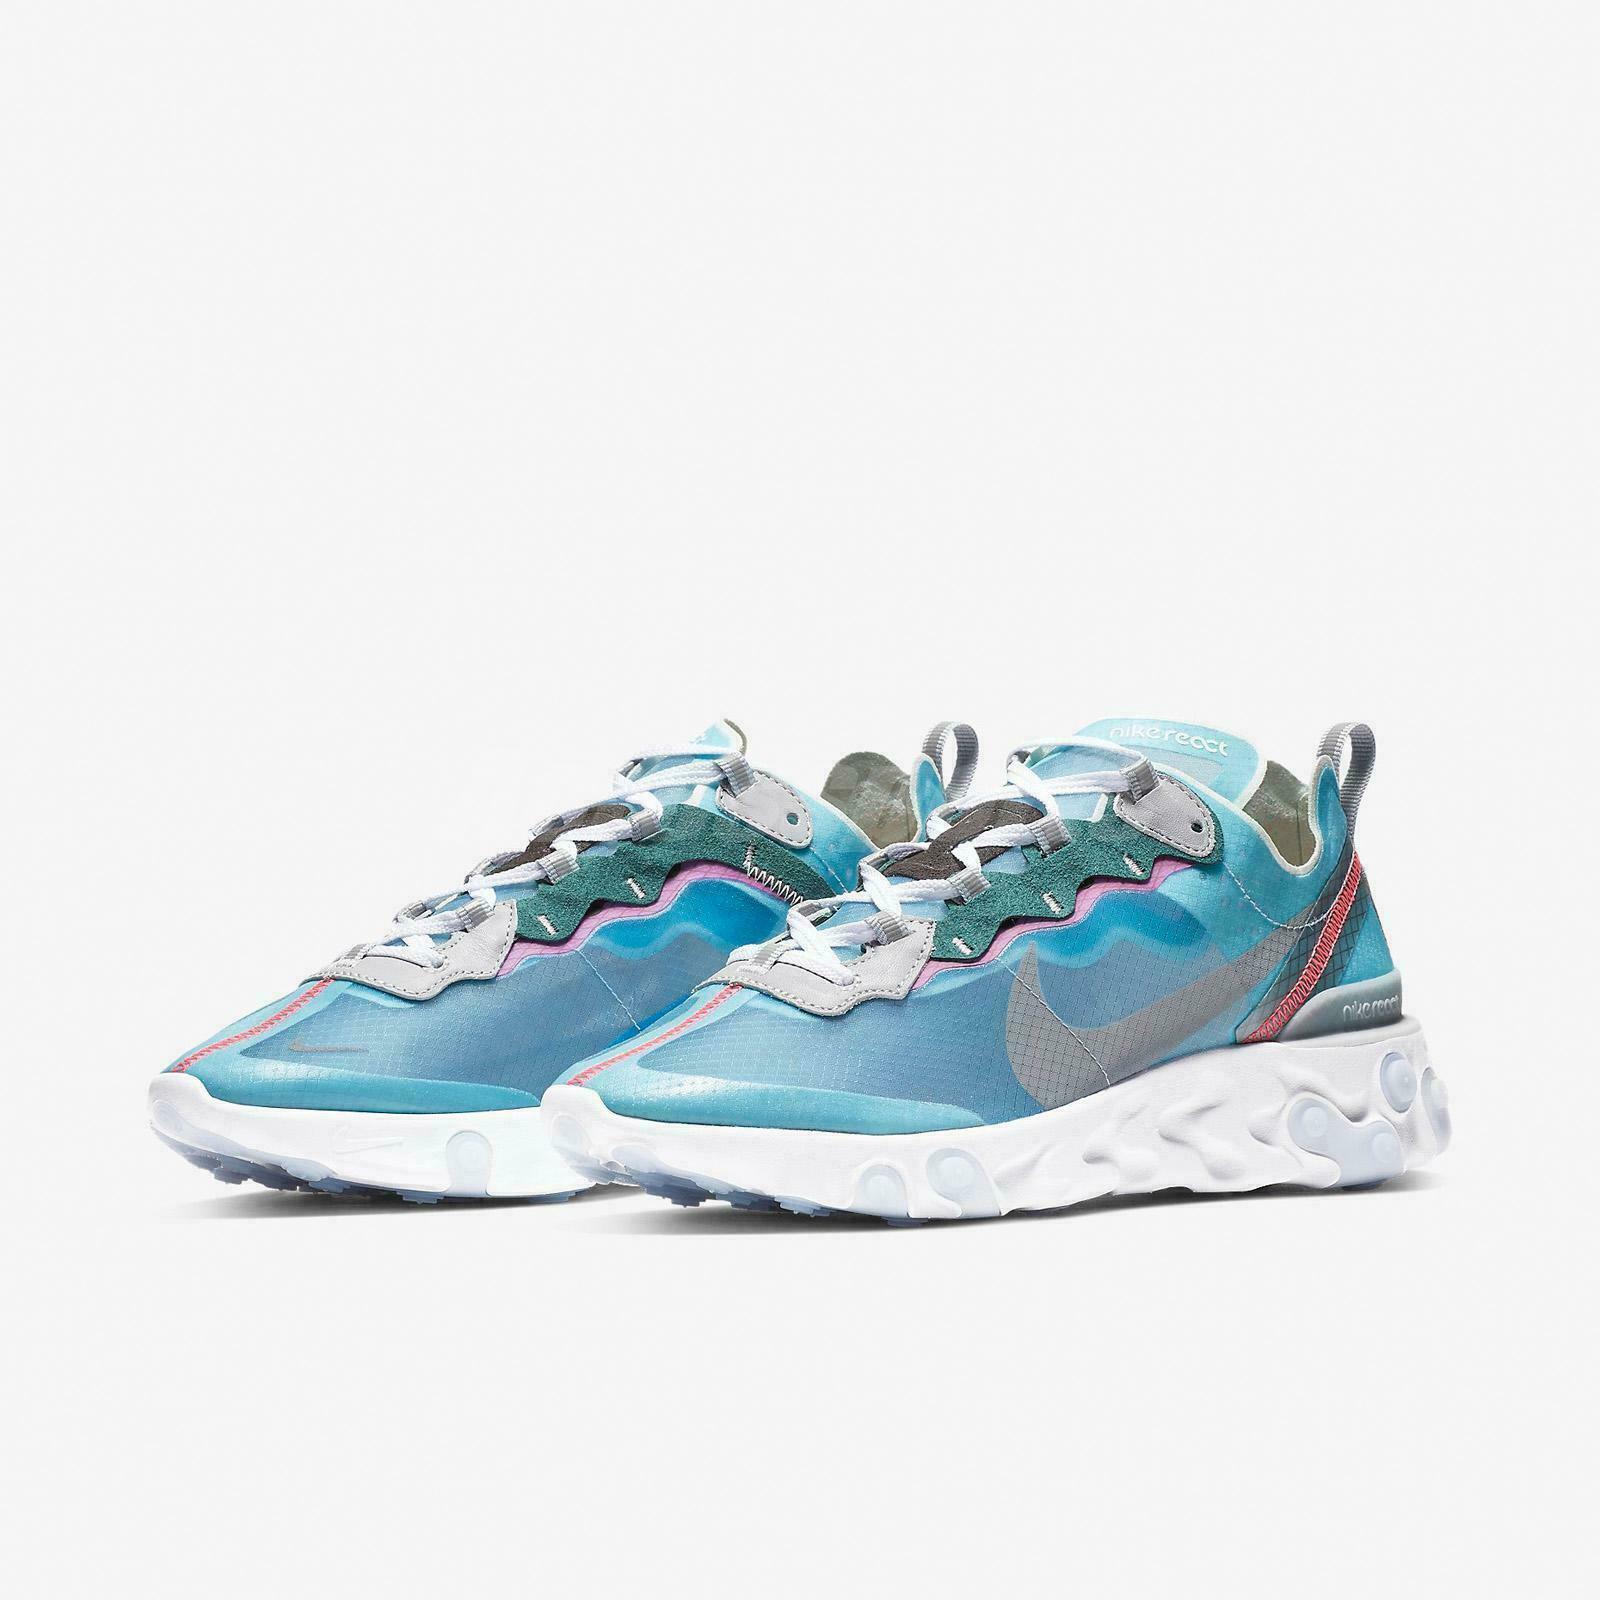 Nike Reagieren Element 87 Farbe 4 13 Blau Schwarz Wolf Grau